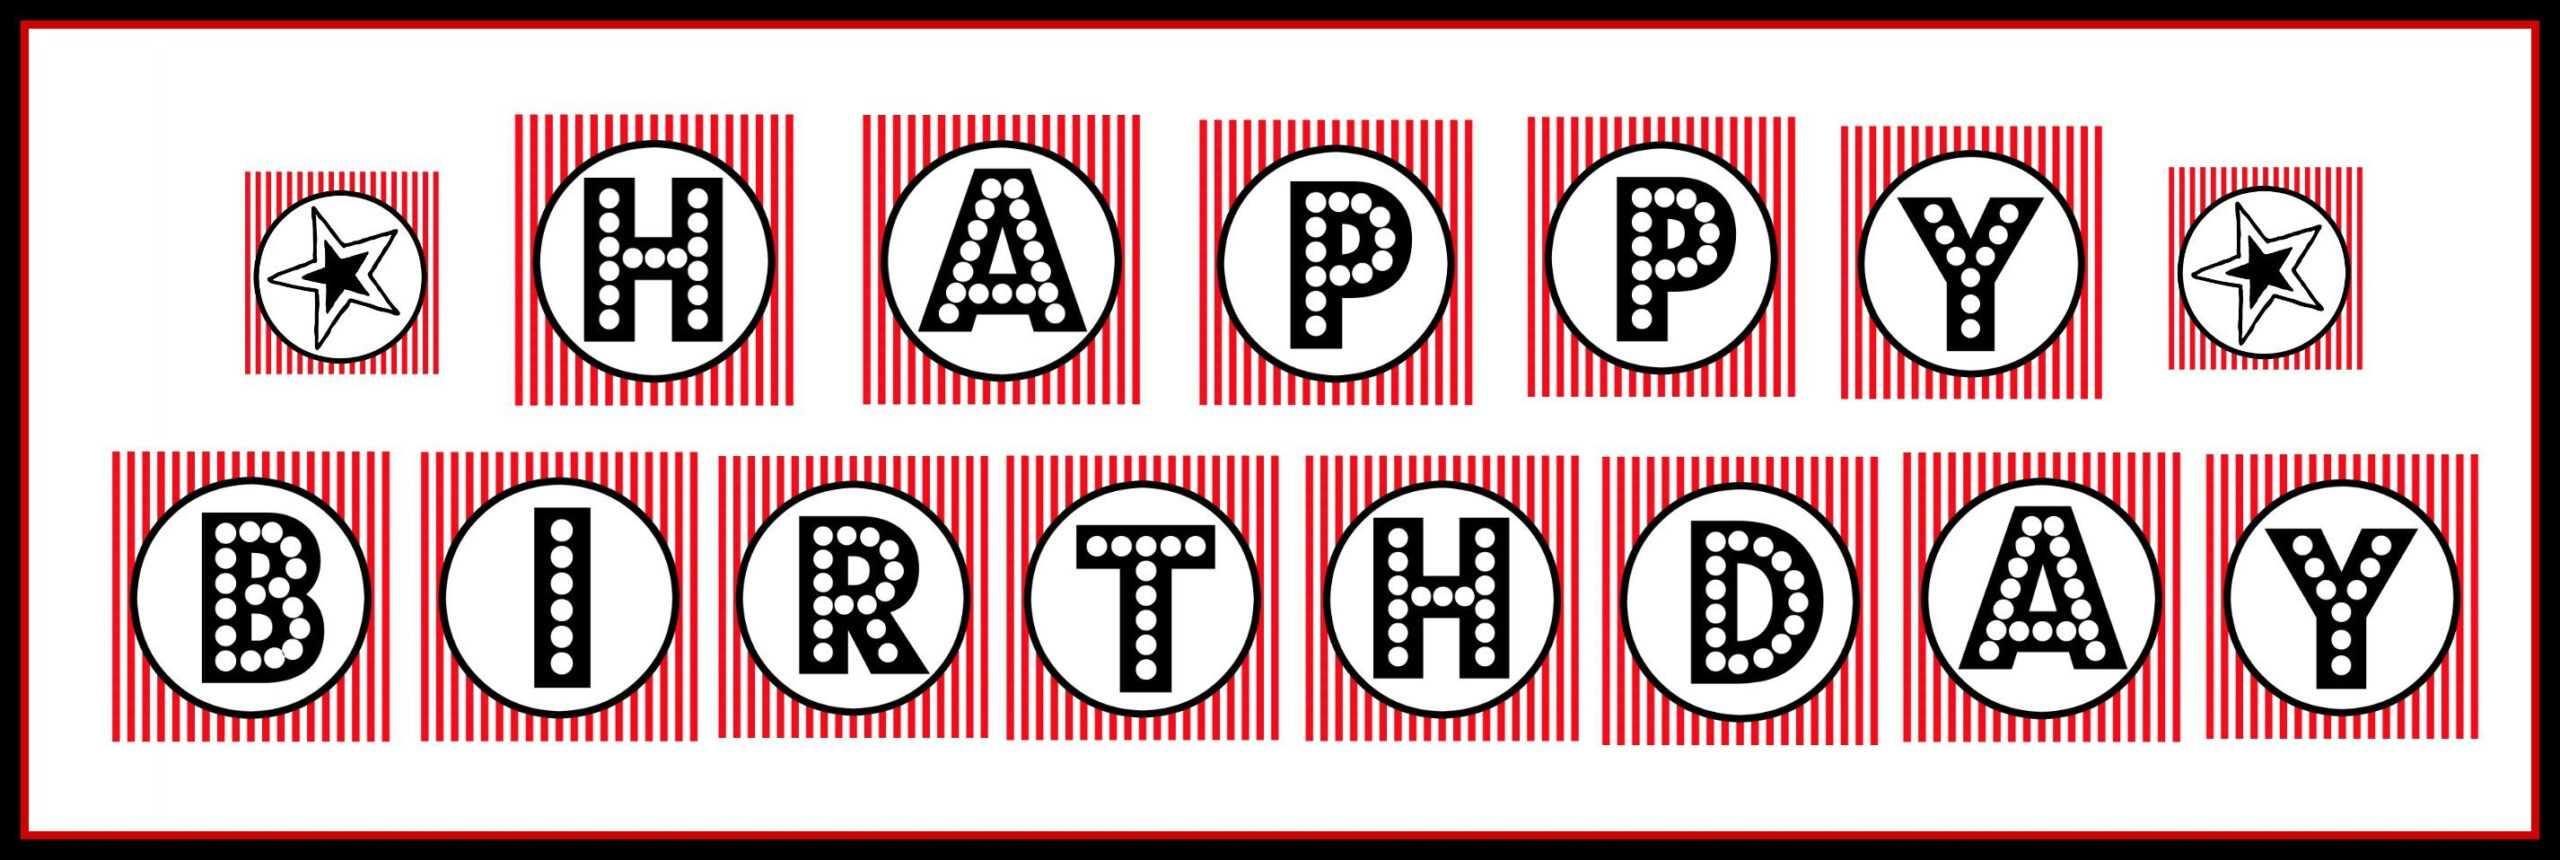 Free Happy Birthday Banner Template – Raptor.redmini.co For Free Printable Happy Birthday Banner Templates